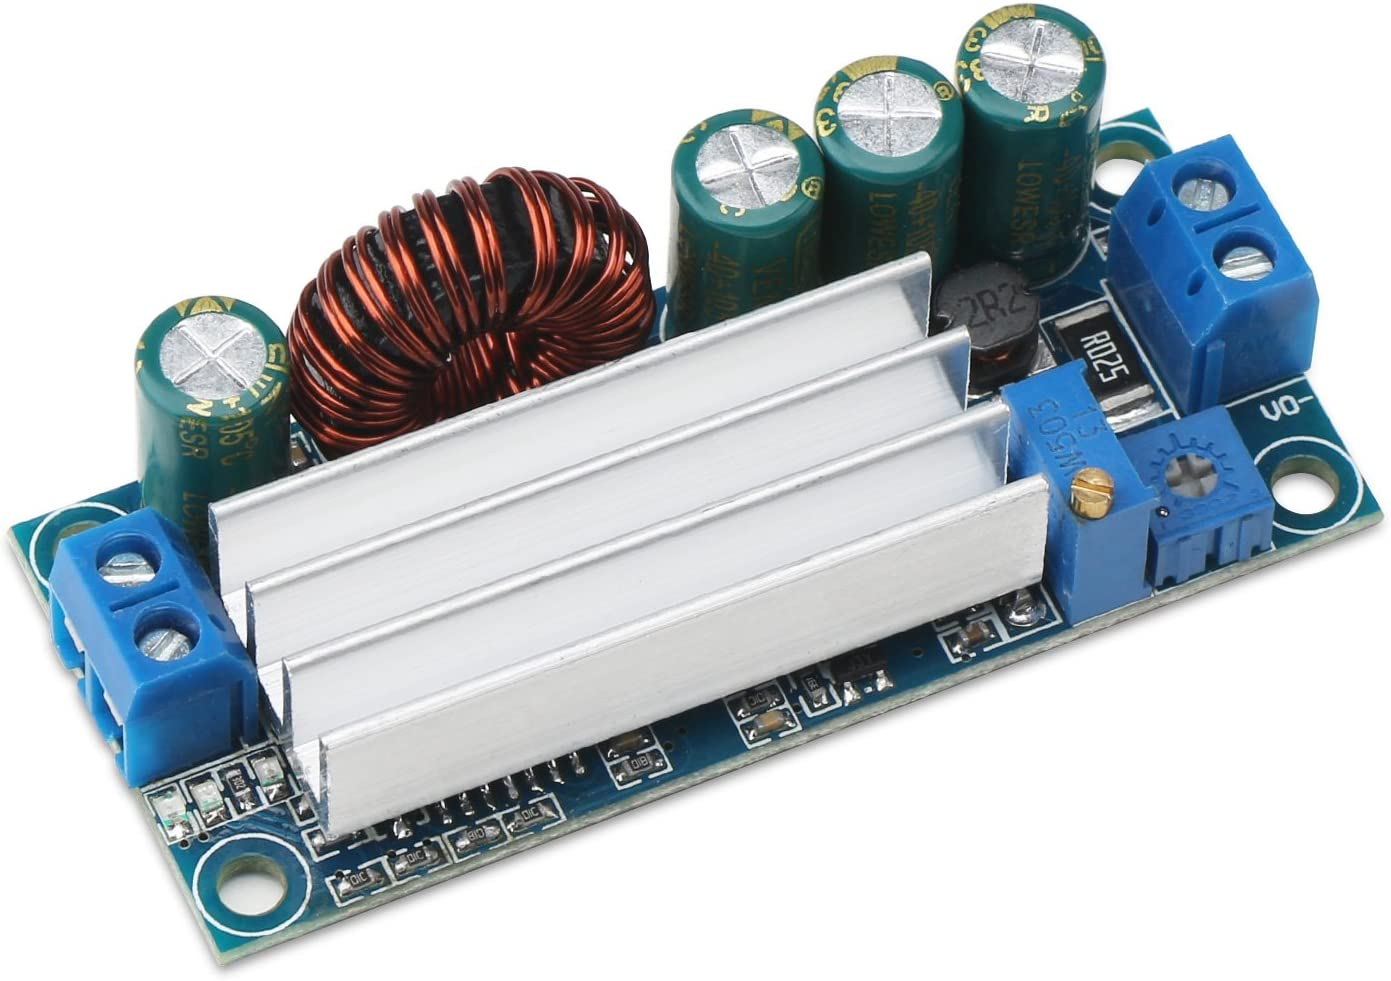 Buck Boost Converter, DROK DC-DC Buck Boost Converter Voltage Step Up Down Regulator CC CV 5-30V to 0.5-30V Adjustable Power Supply Transformer Module